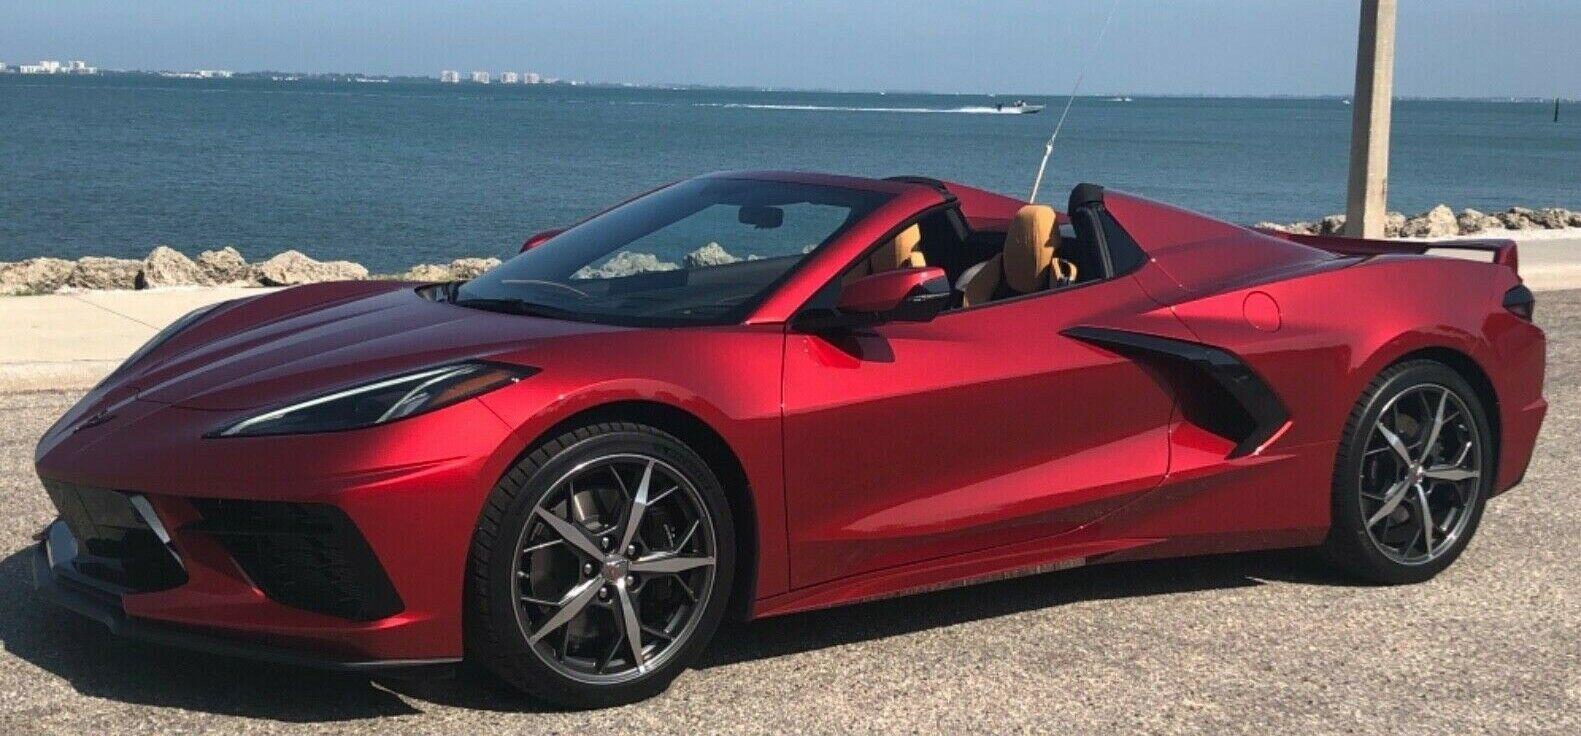 2021 Red Mist Metallic Tintcoat Chevrolet Corvette   | C7 Corvette Photo 5